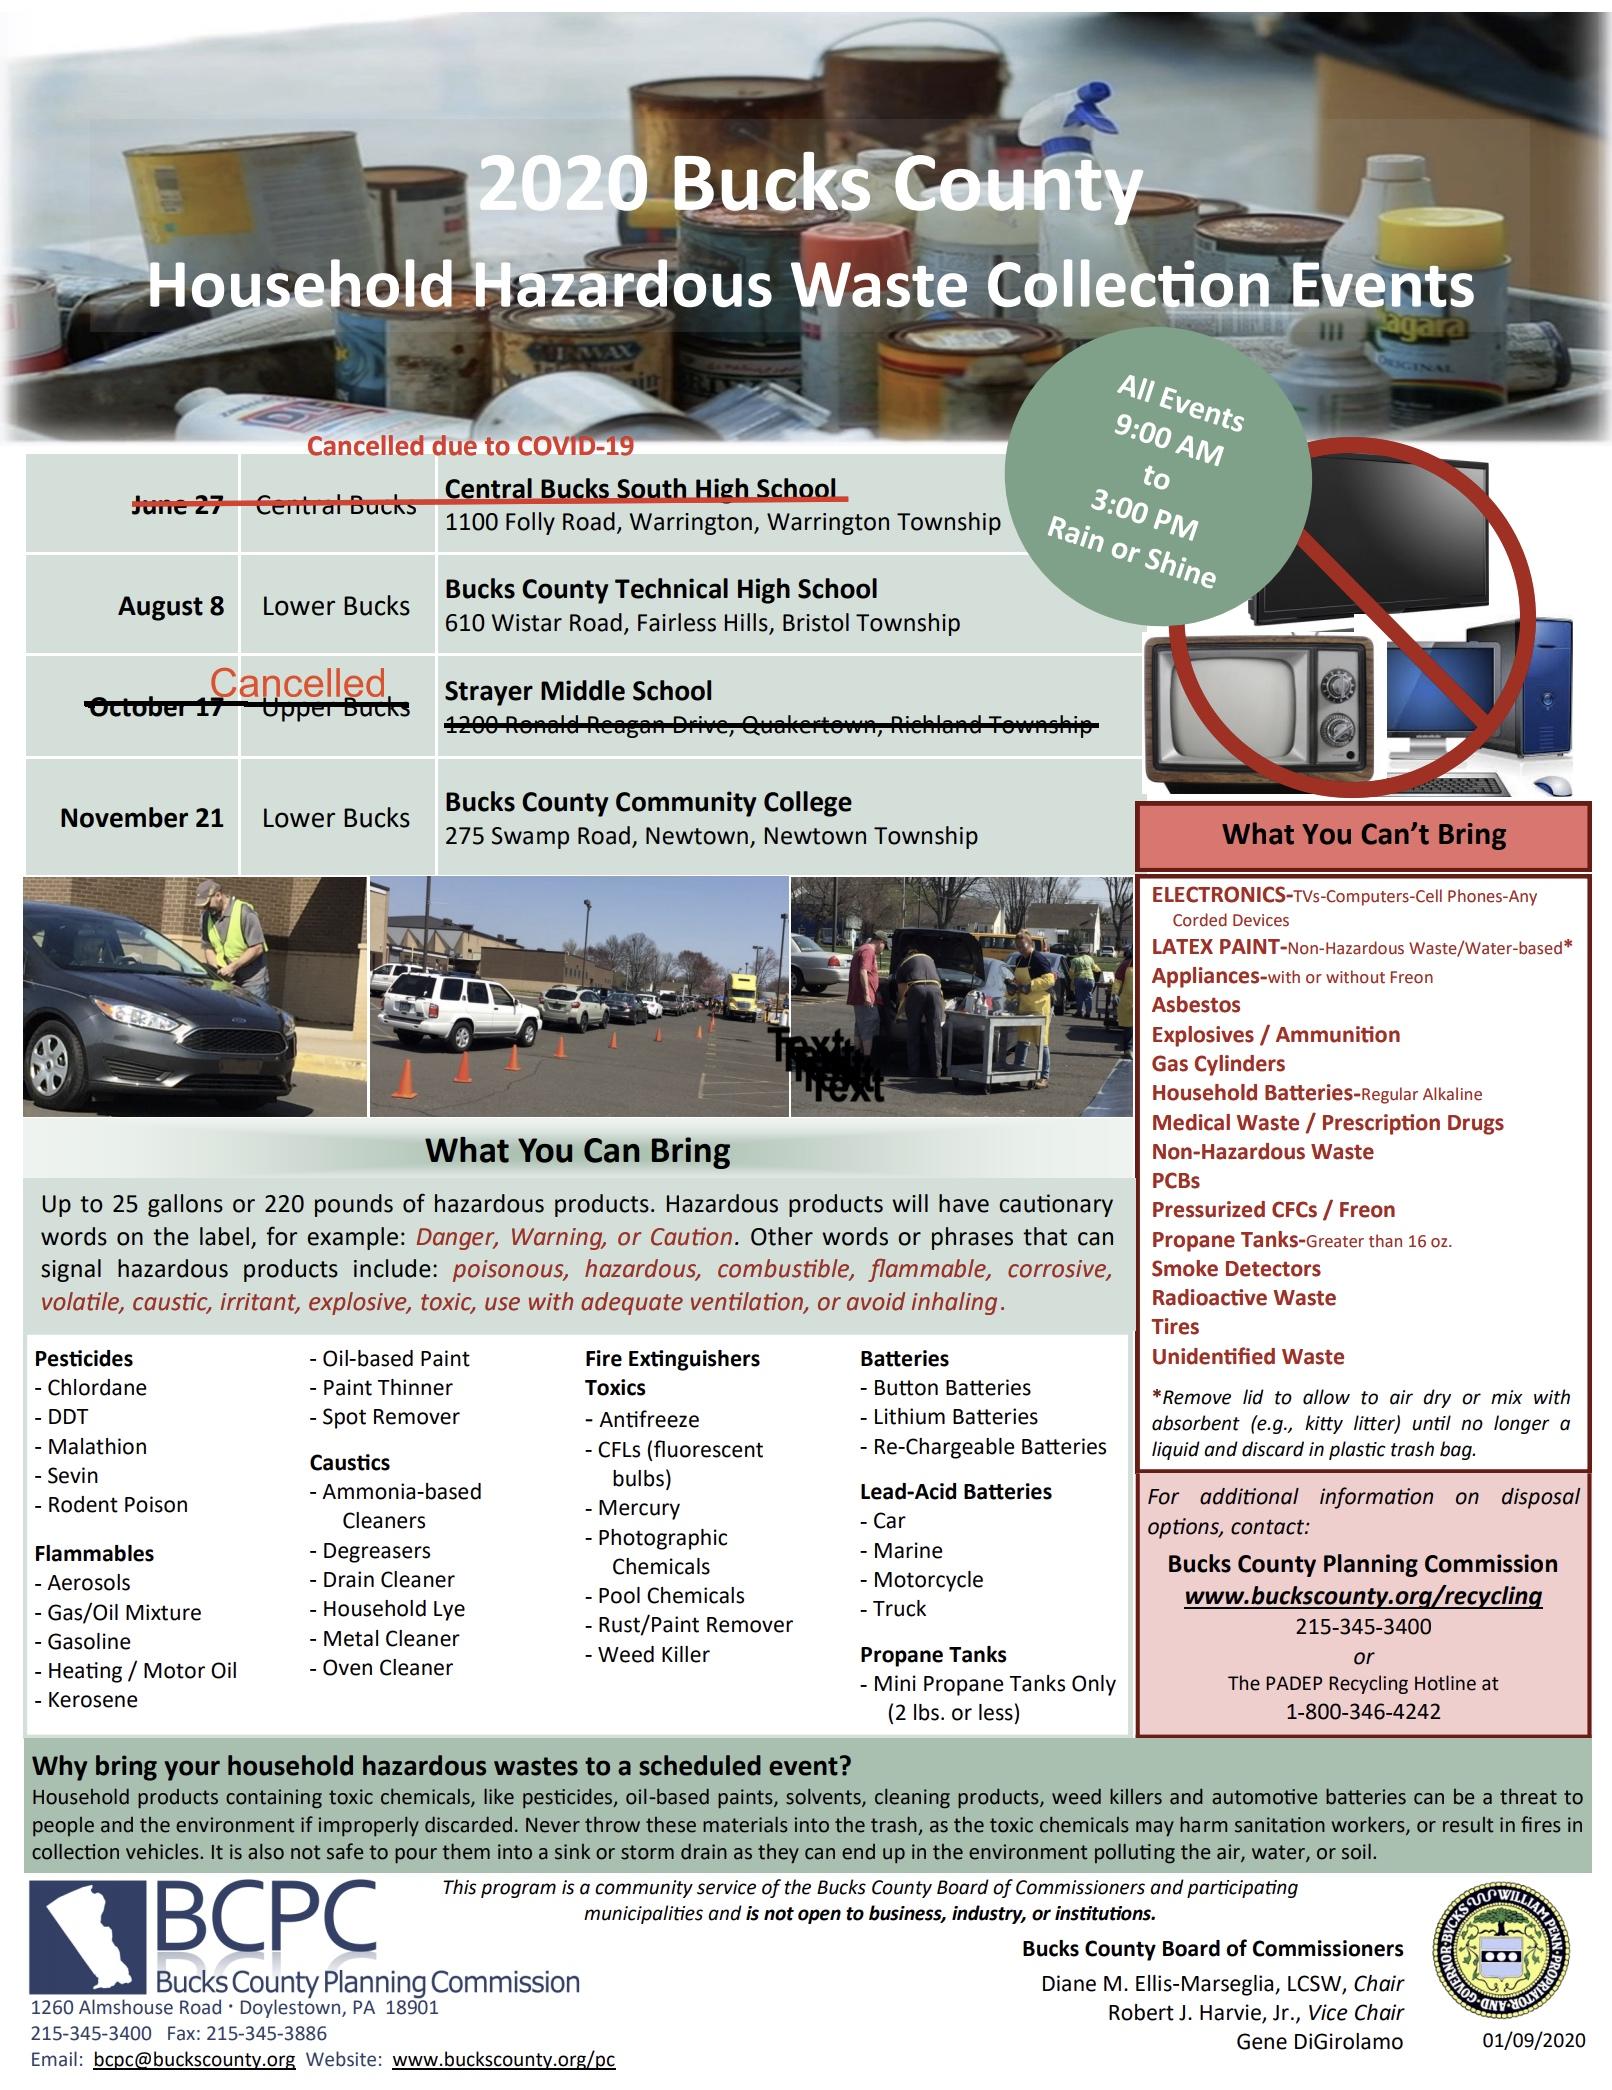 Household Hazardous Waste Collection